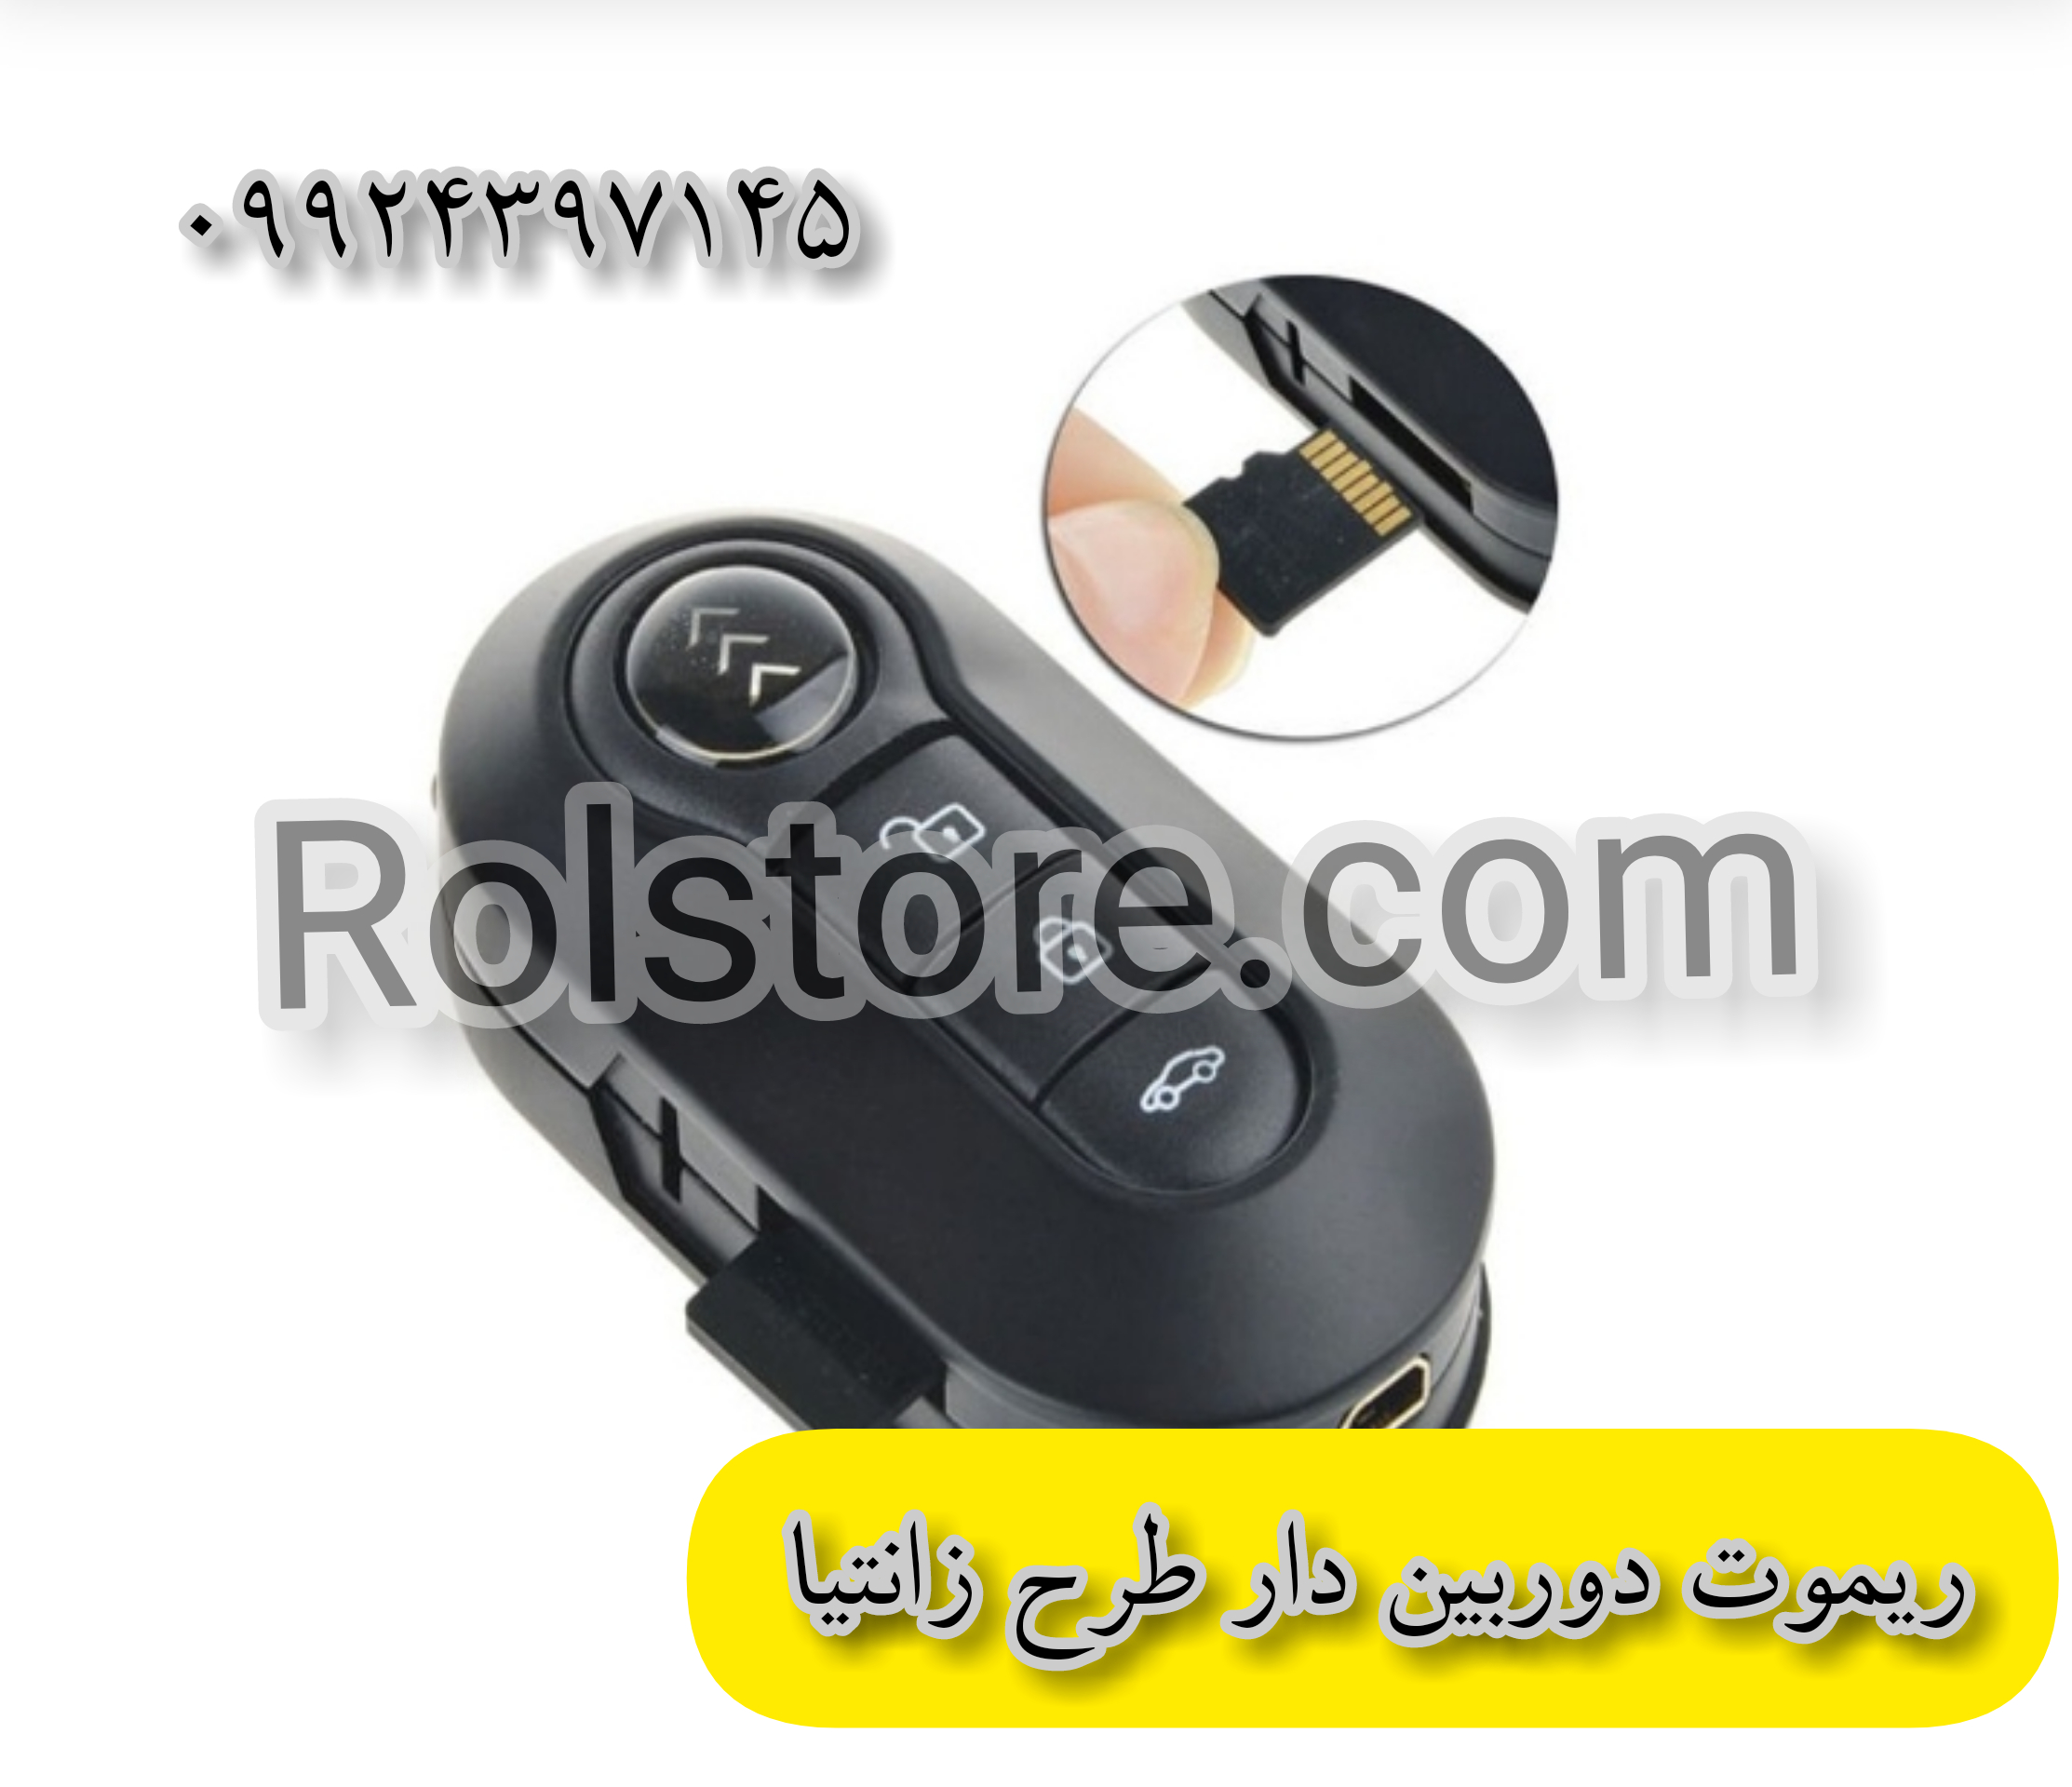 ریموت دوربین دار طرح زانتیا/۰۹۹۲۴۳۹۷۱۴۵/میکرفون ریموتی زانتیا